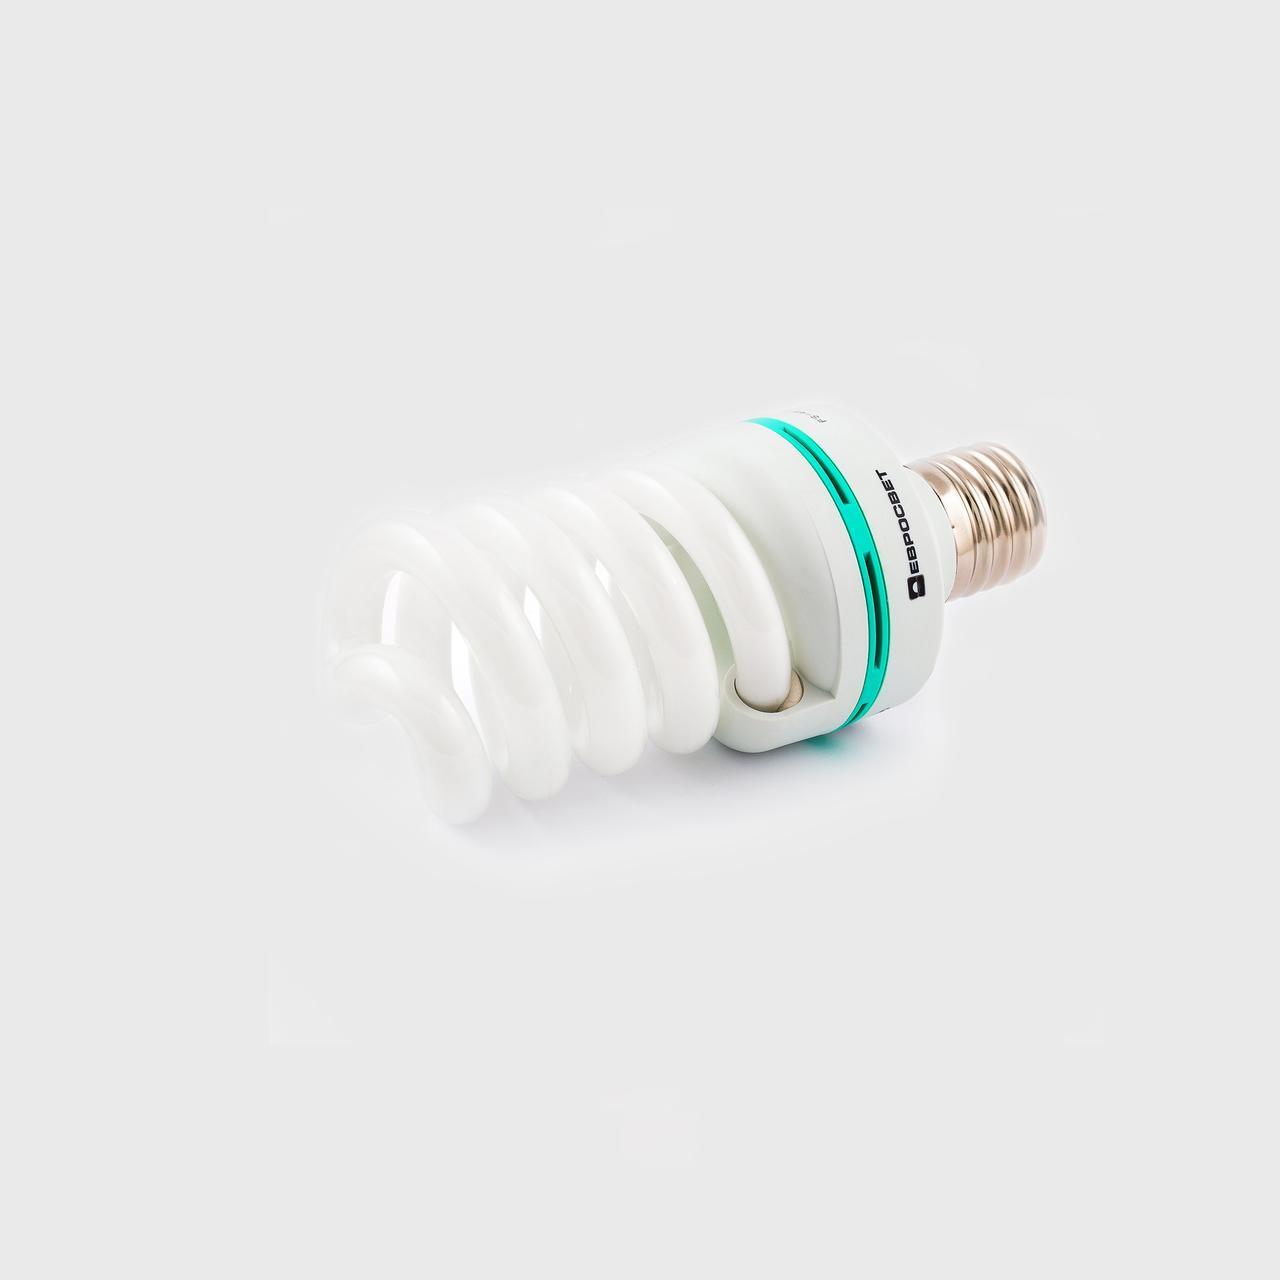 Лампа энергосберегающая 45W E40 4200K HS-45-4200-40